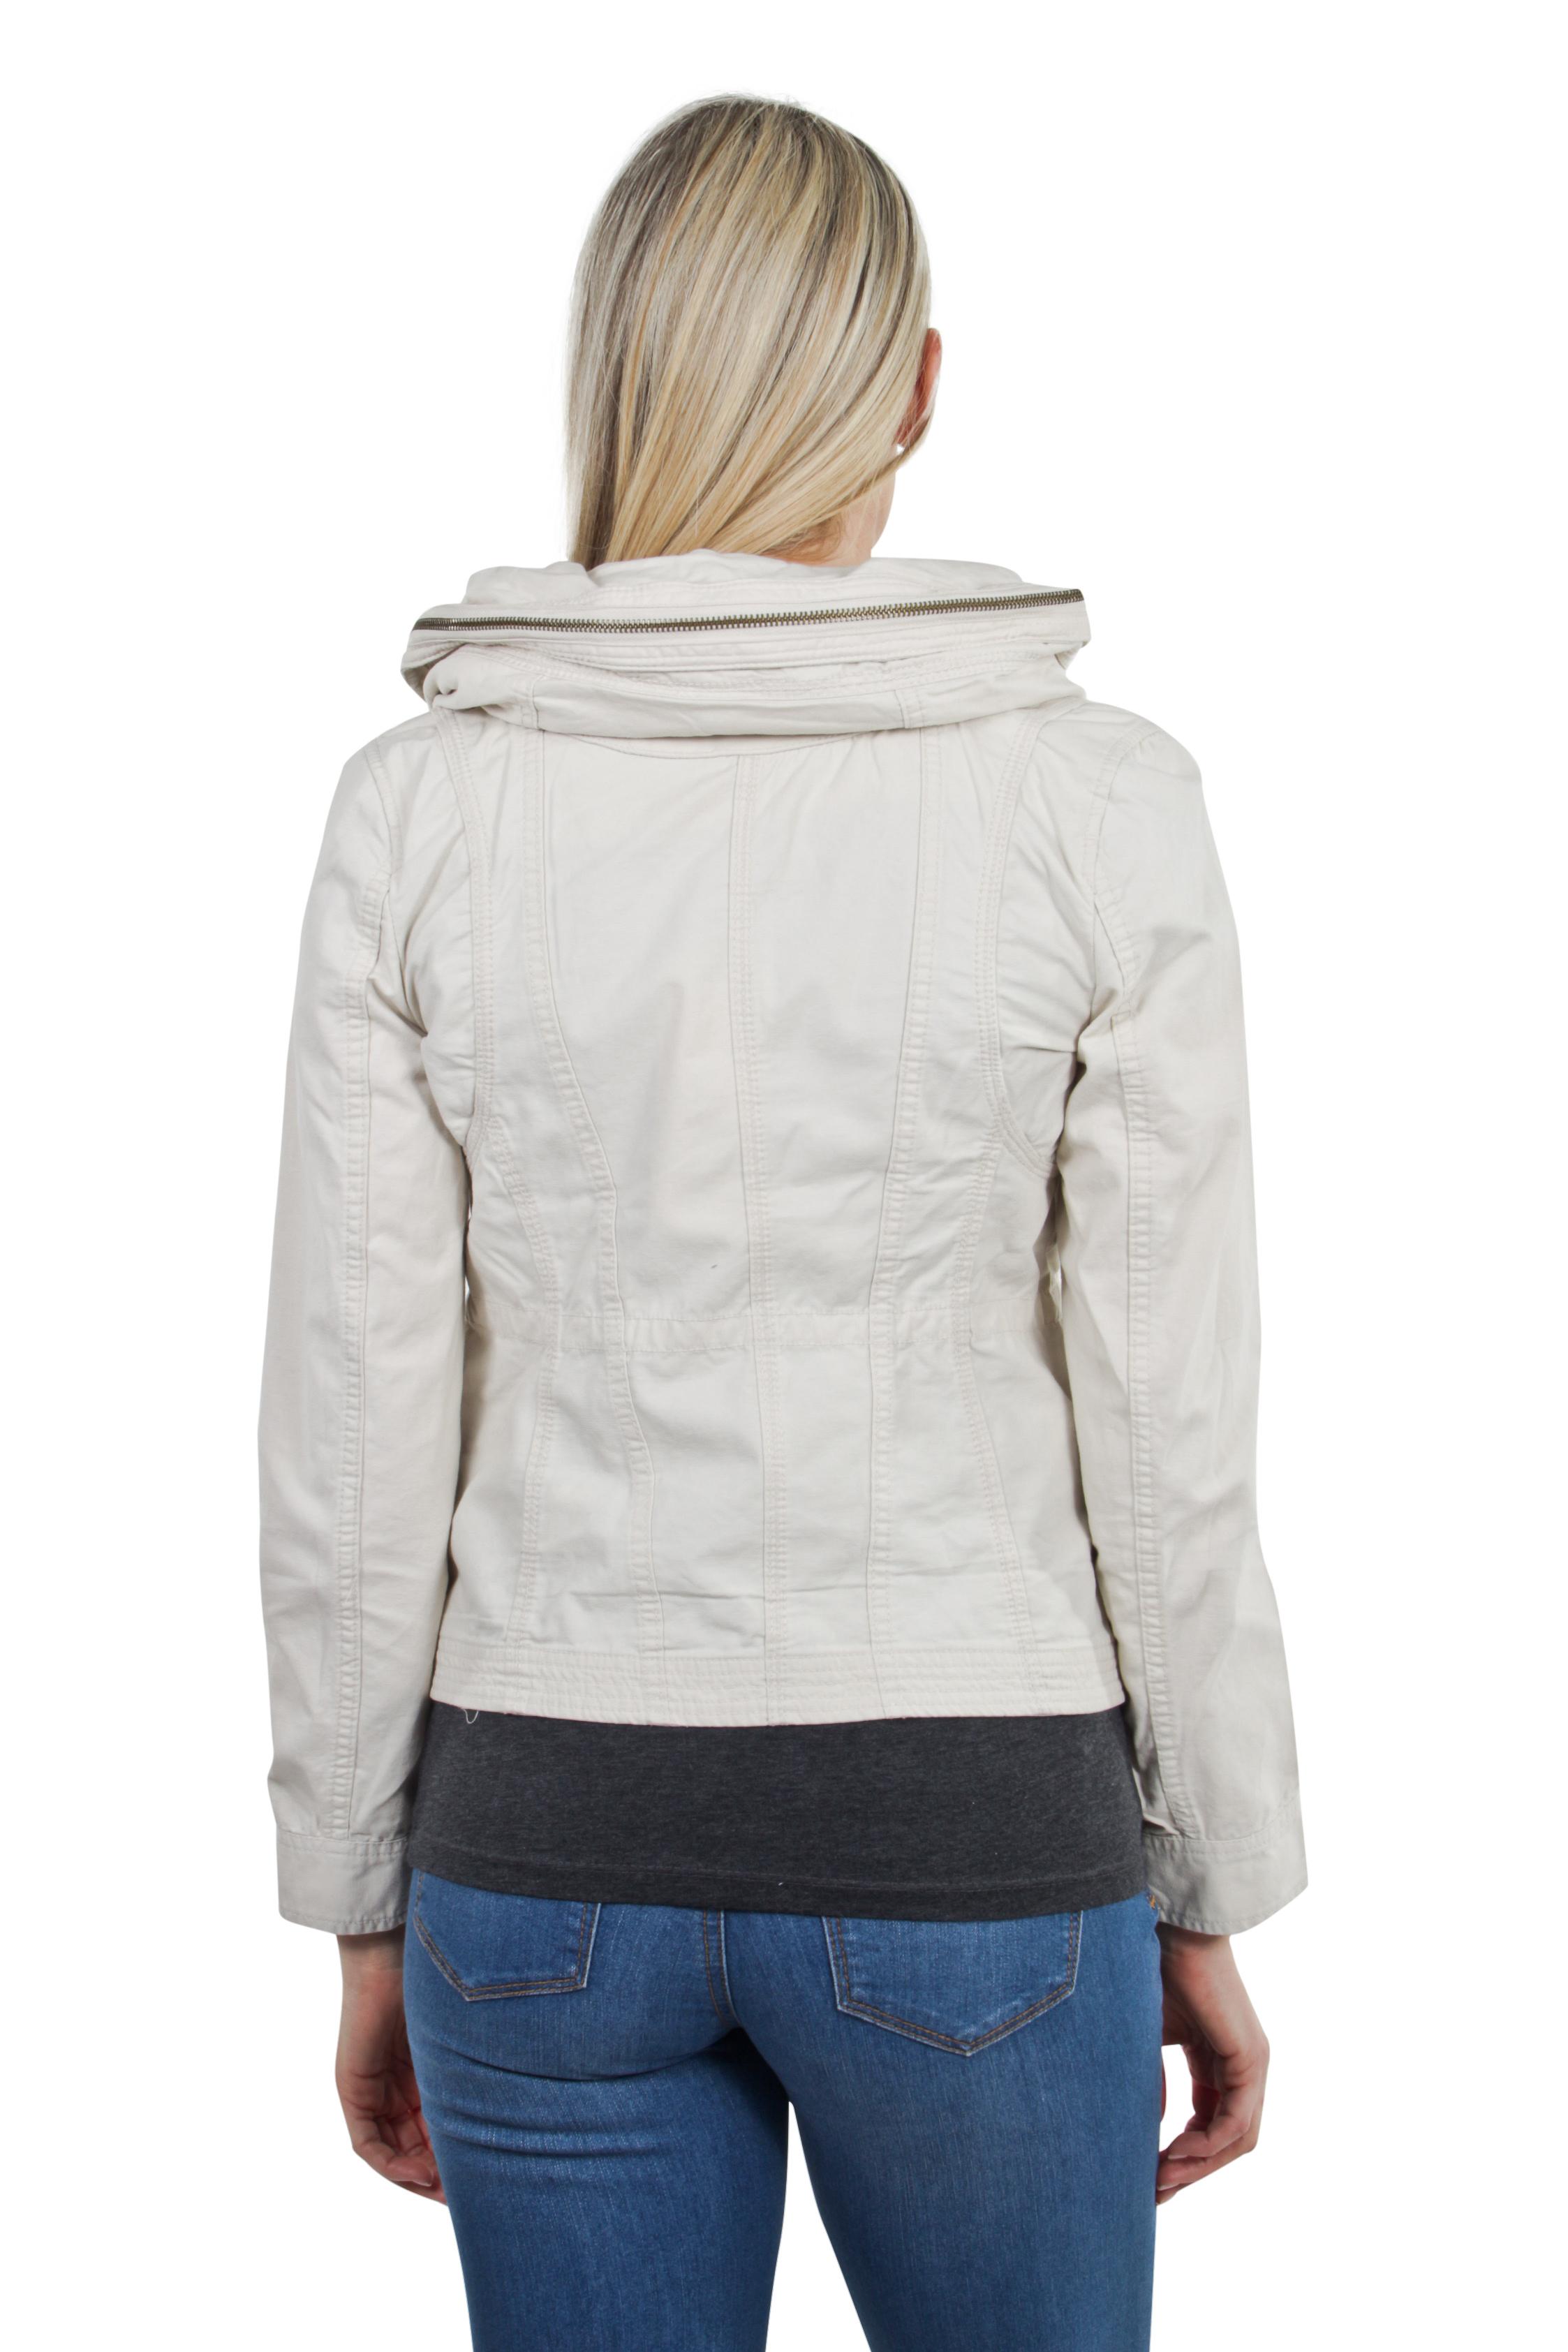 Women-039-s-Juniors-Anorak-Safari-Hoodie-Long-Sleeve-Jacket thumbnail 7